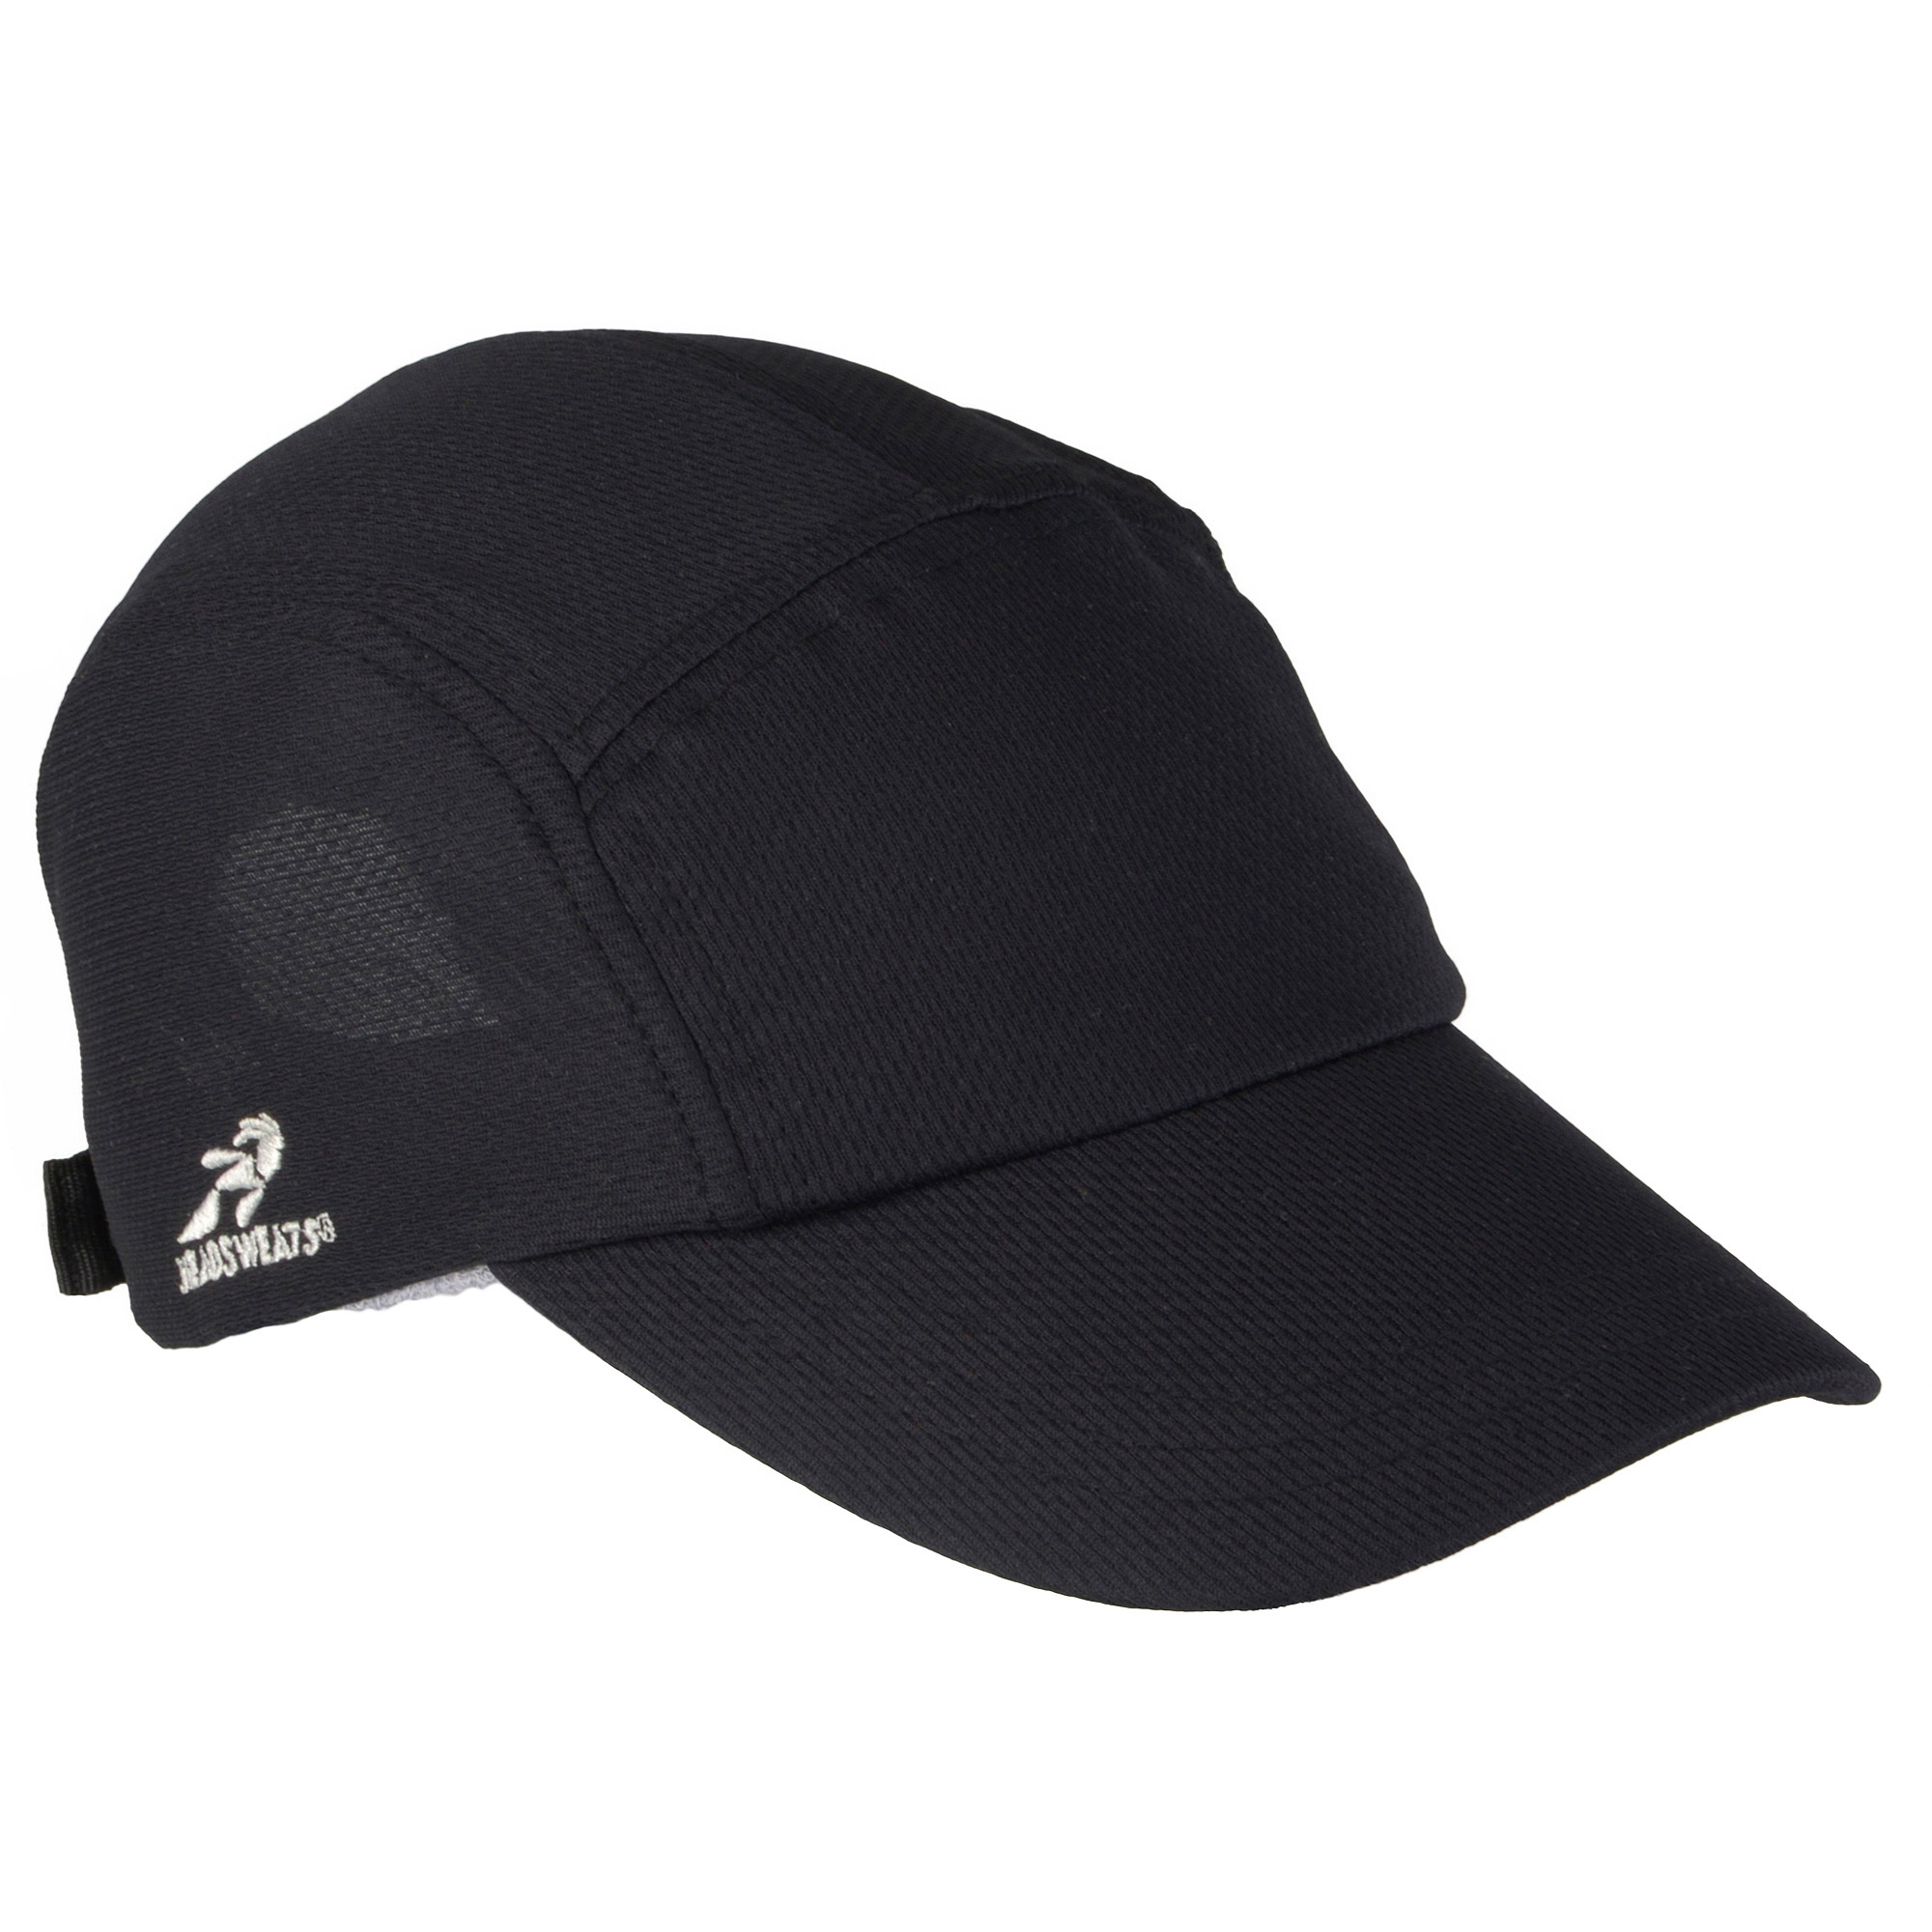 Headsweats Womens Adjustable Soft Shell Cap